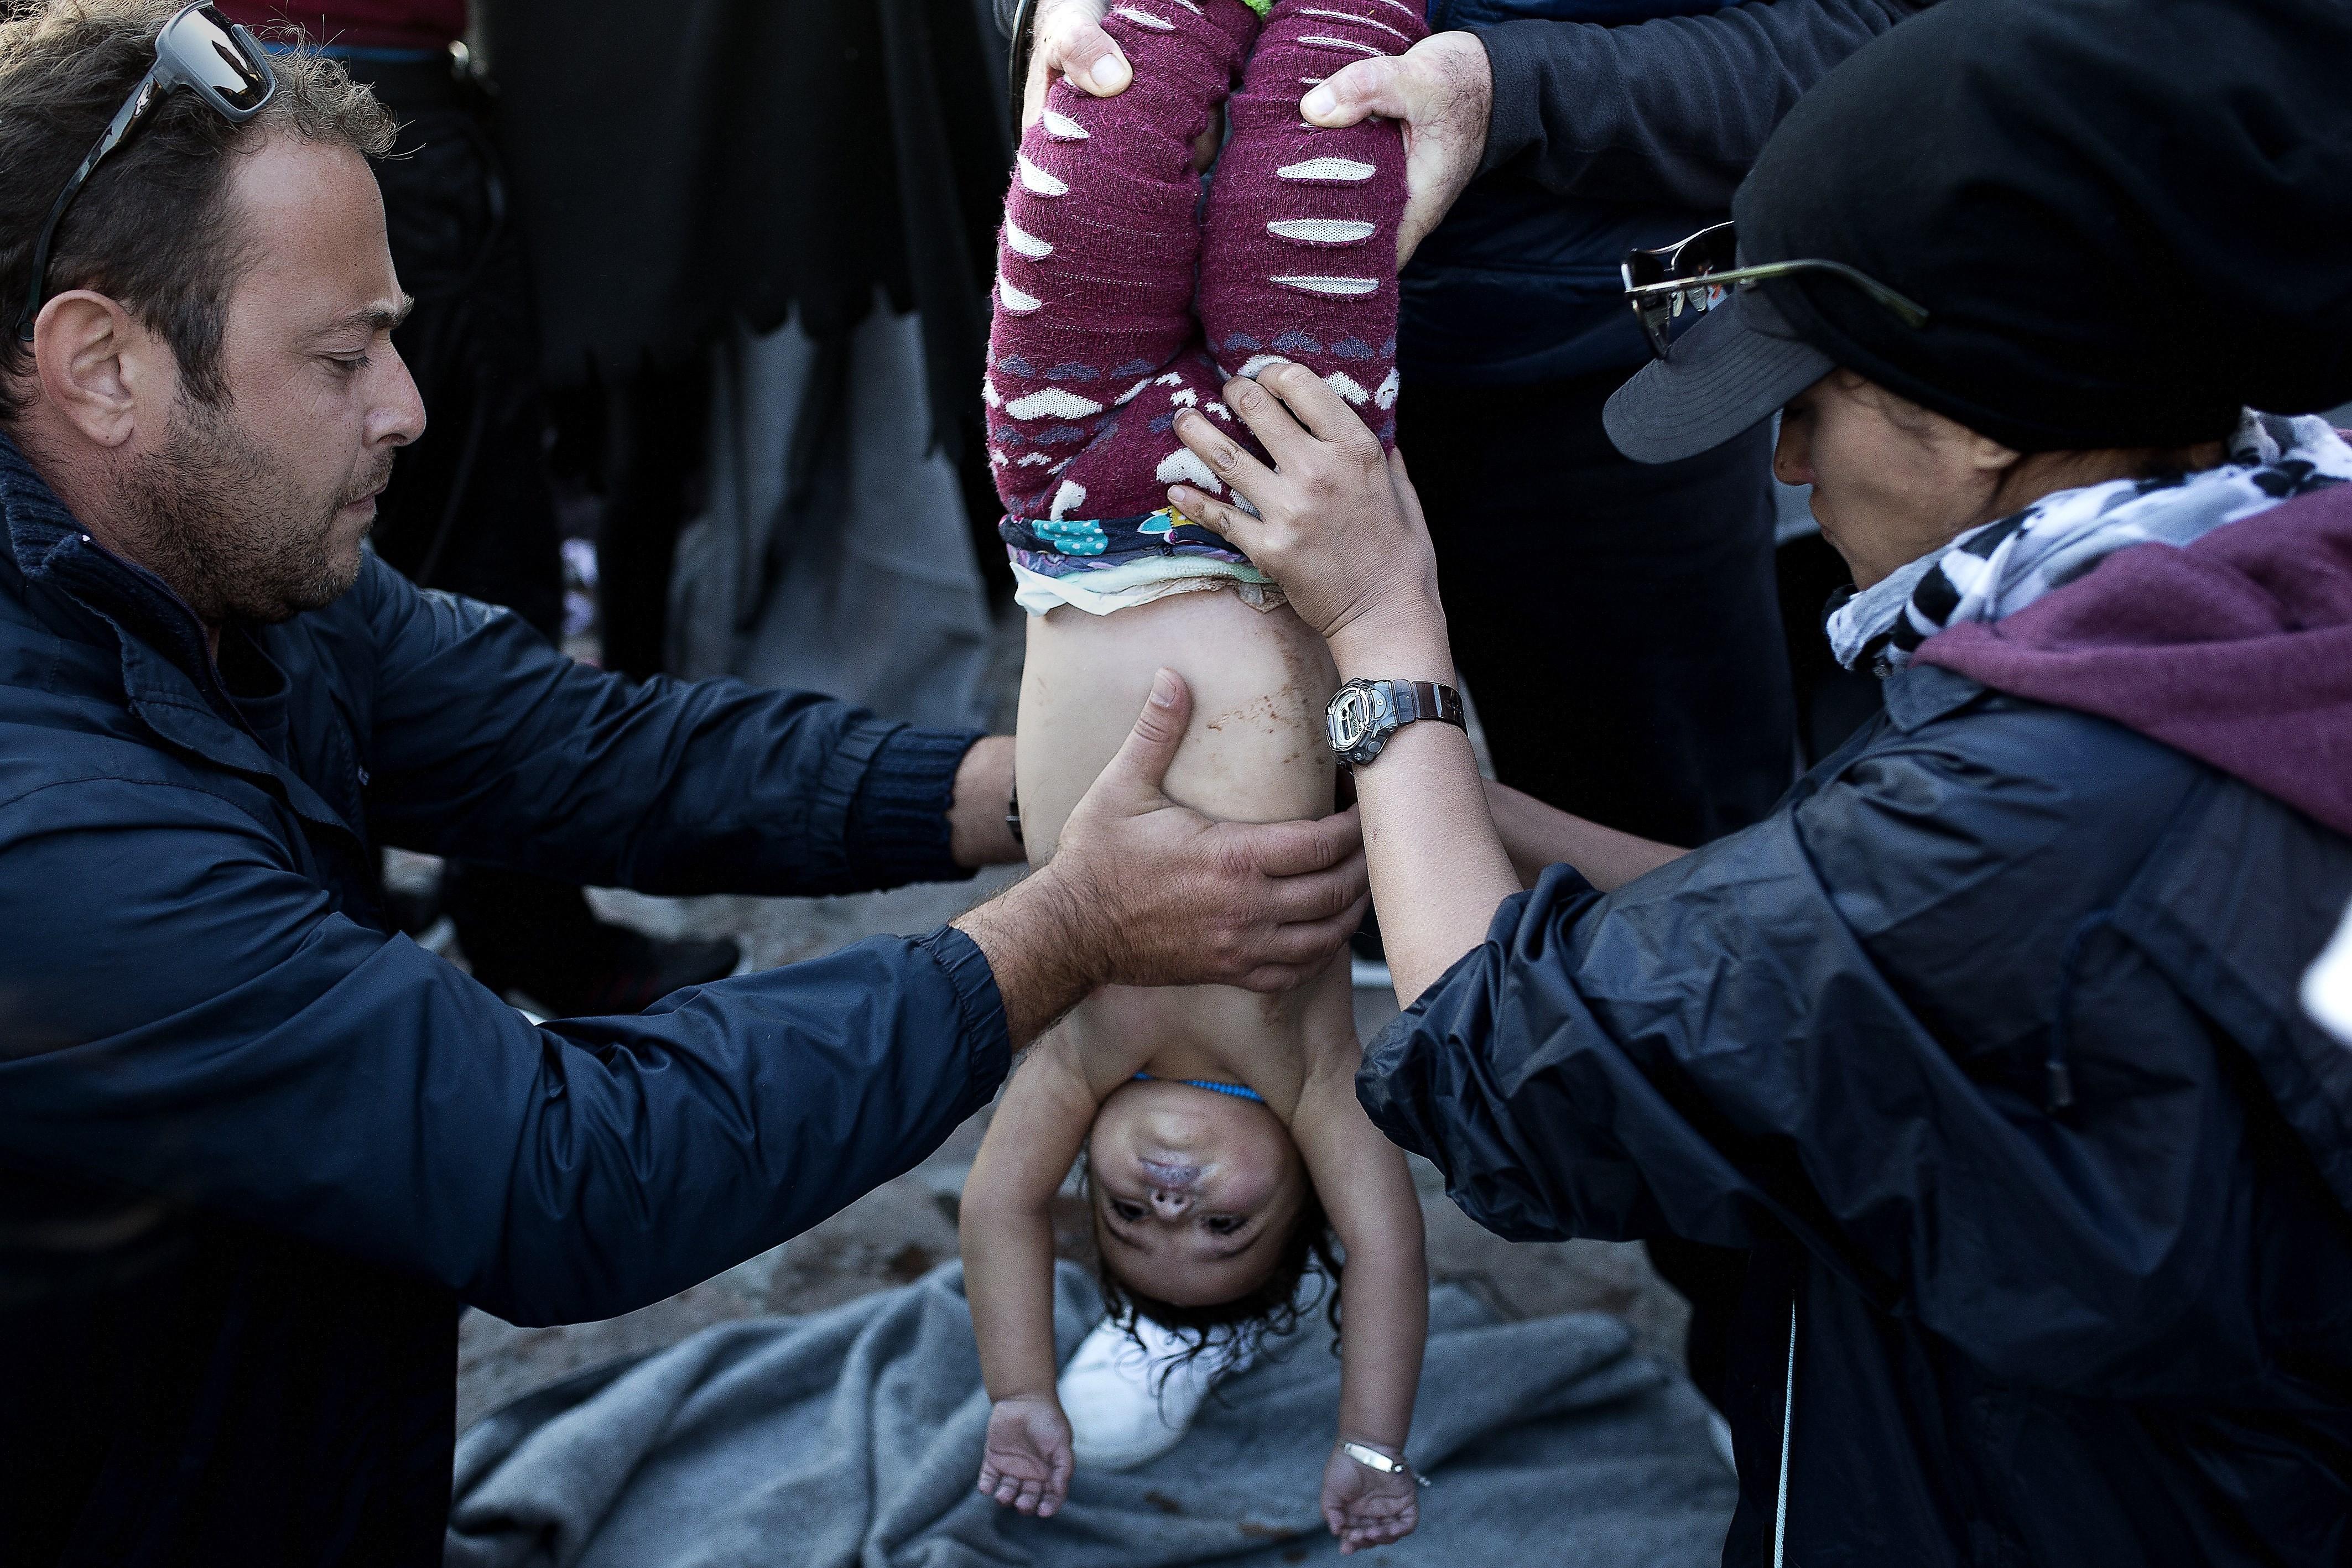 lesvos refugees october 28